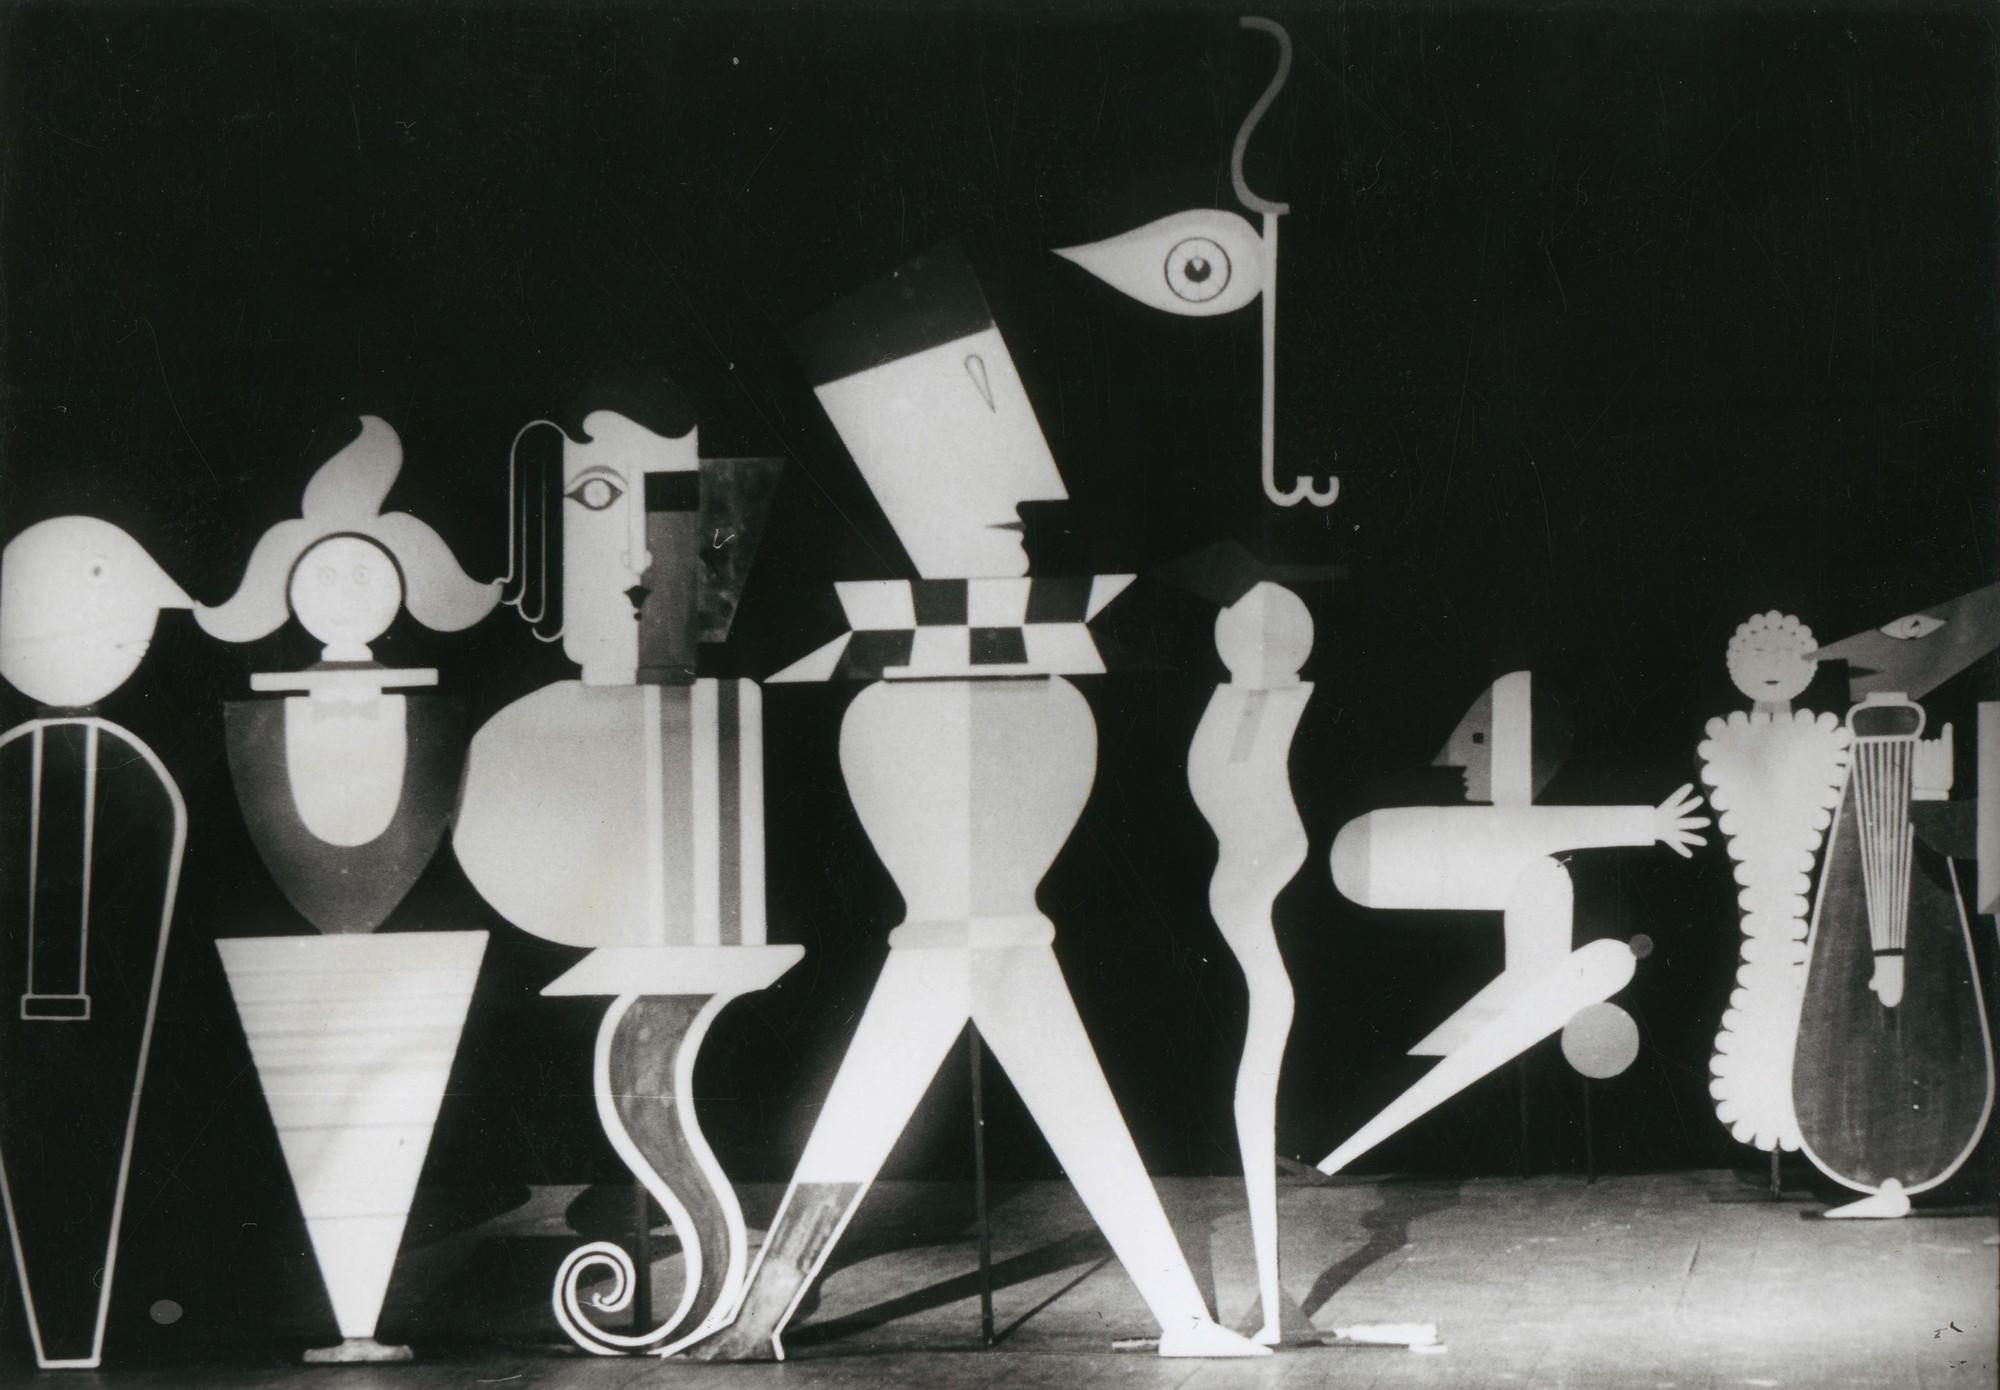 """Gabinet figur"", 1927, fot. Strauch/Halle (?), wł. Bauhaus-Archiv Berlin (źródło: materiały prasowe organizatora)"